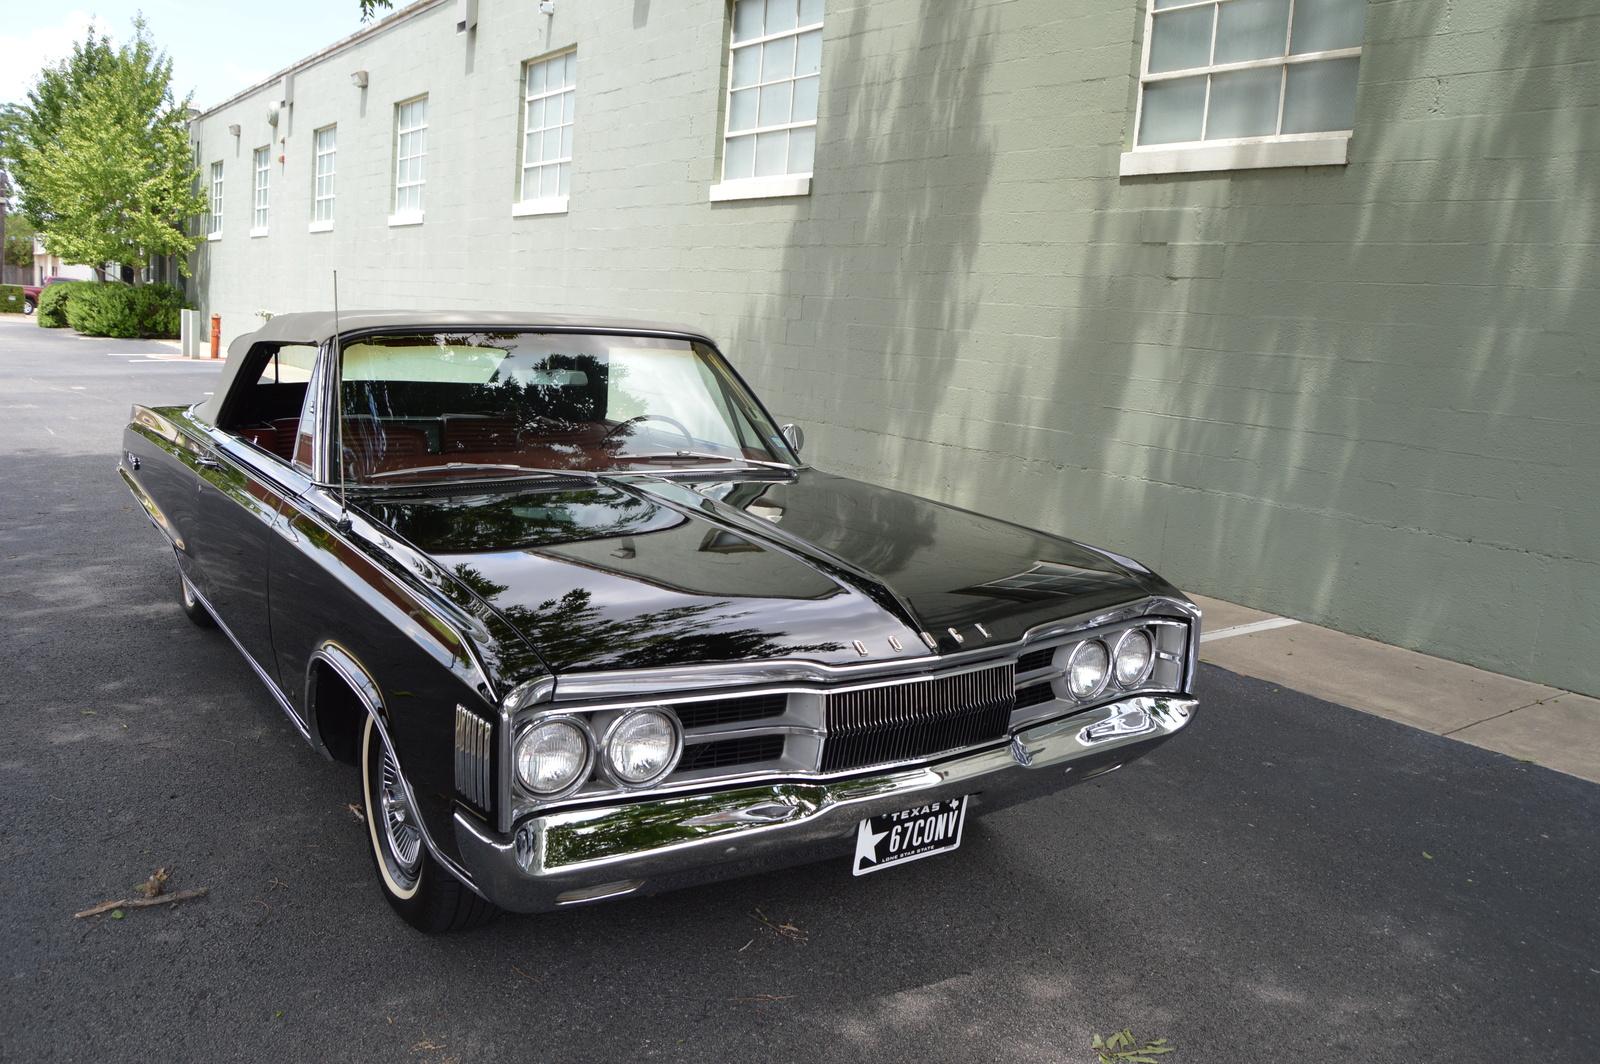 1967 Dodge Polara - Overview - CarGurus